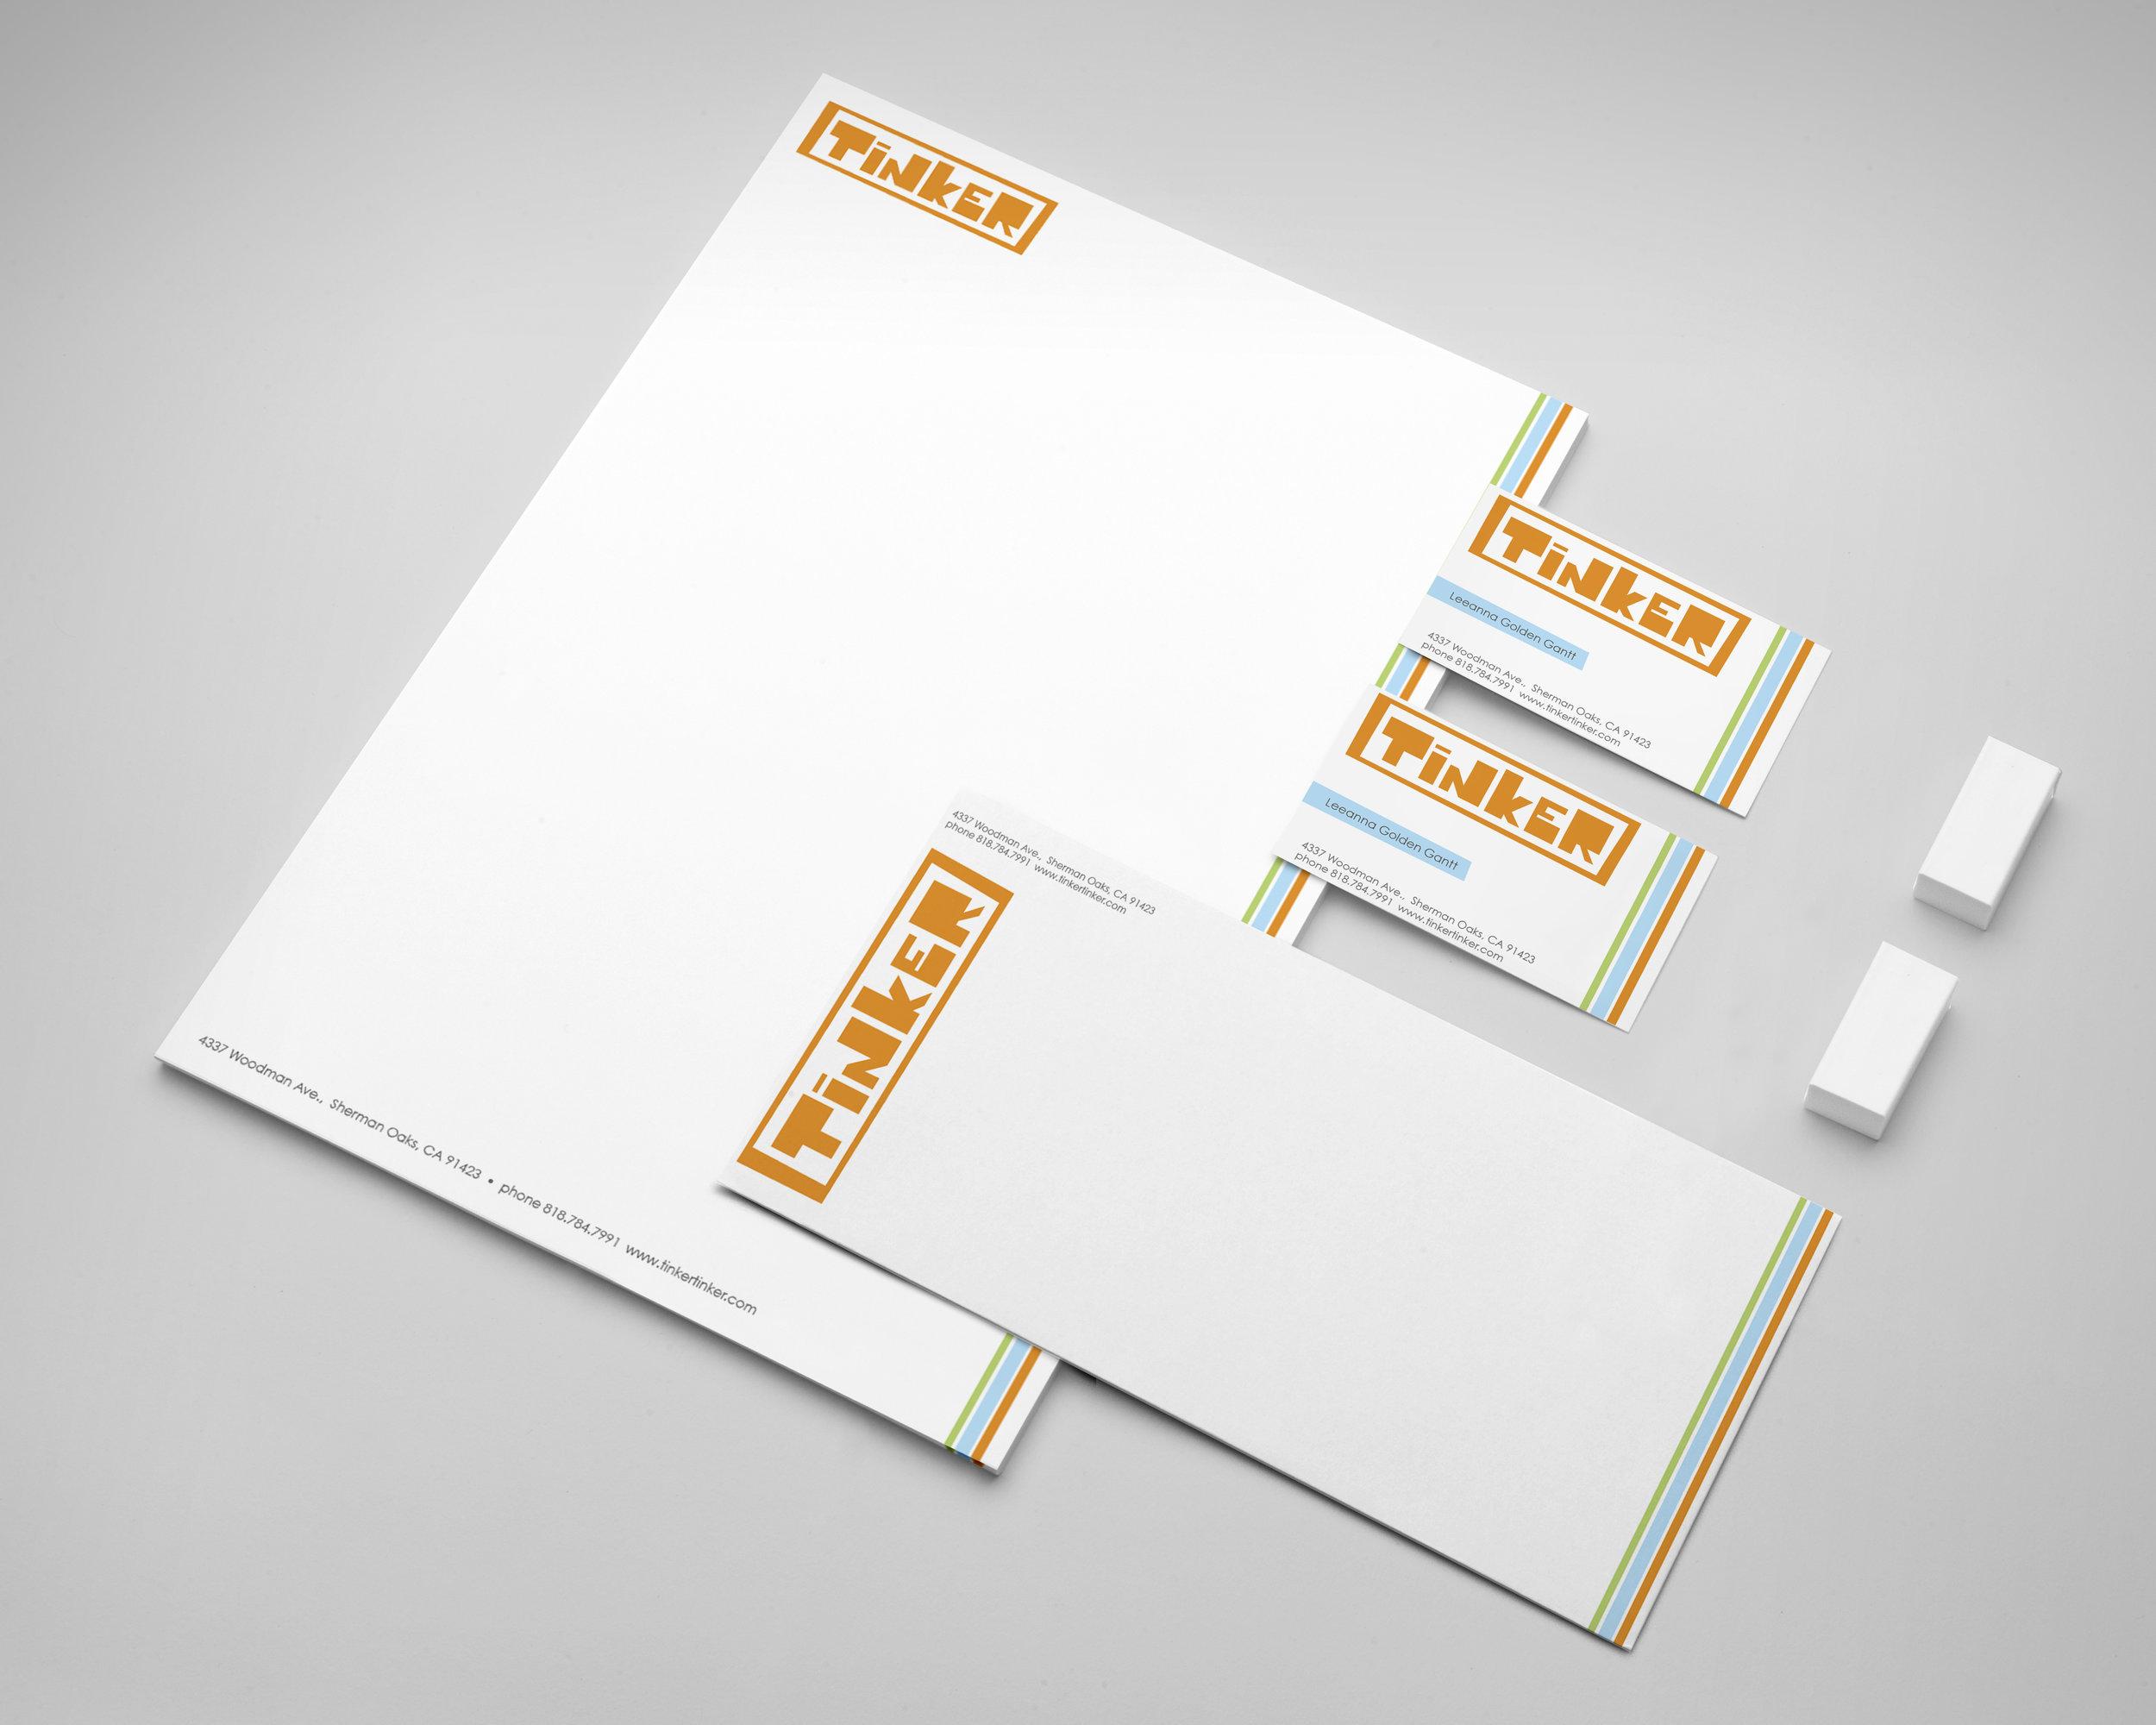 Stationery Mockup Template - TINKER.jpg